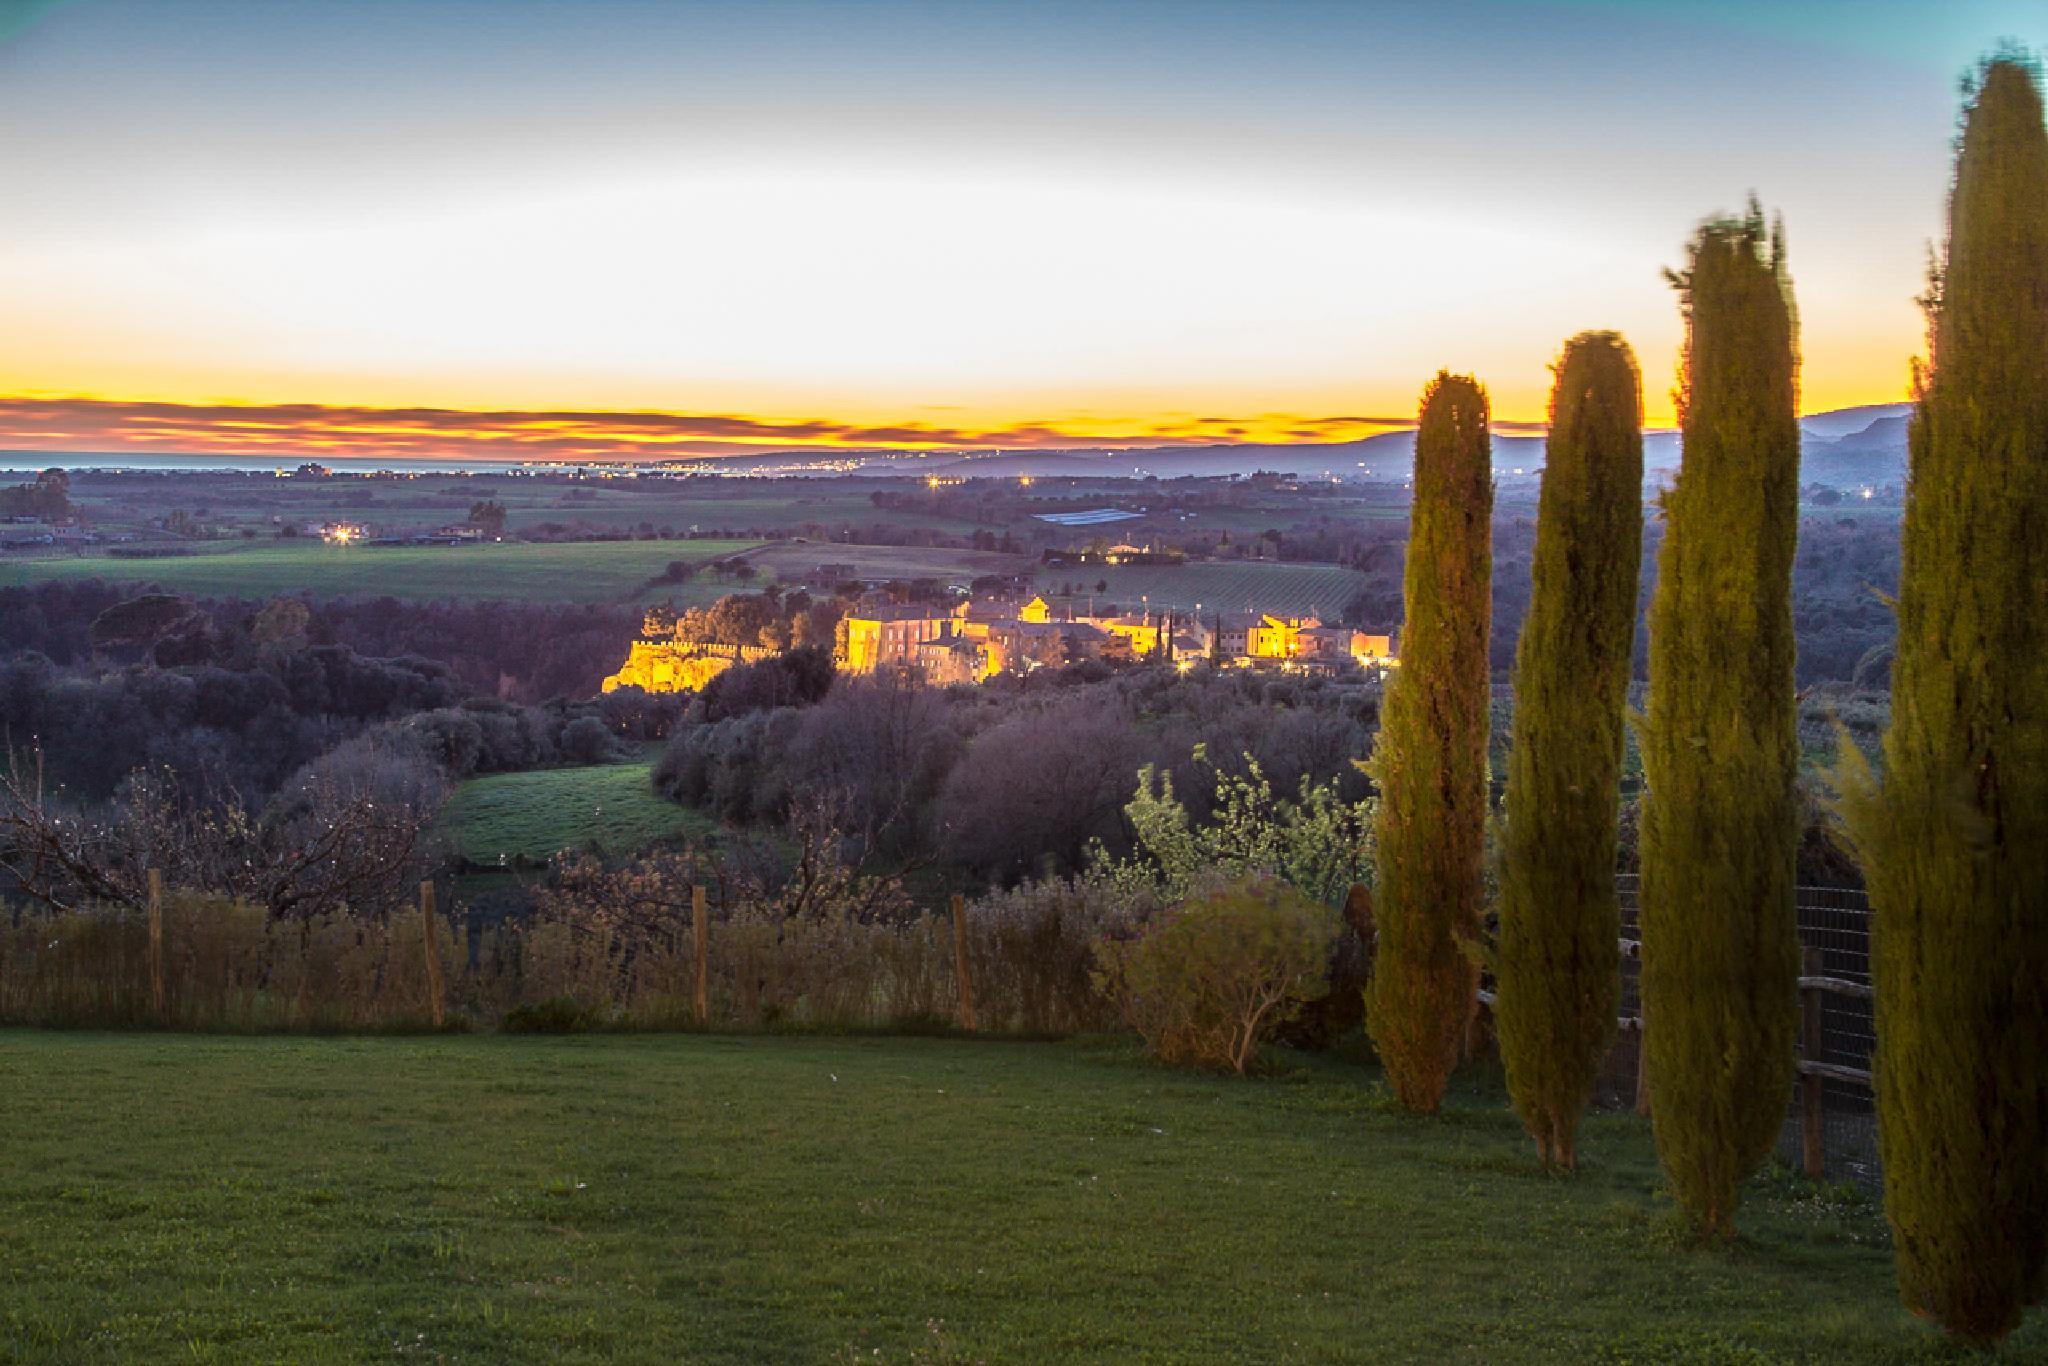 borough of Ceri at dusk by Maurizio Fissi